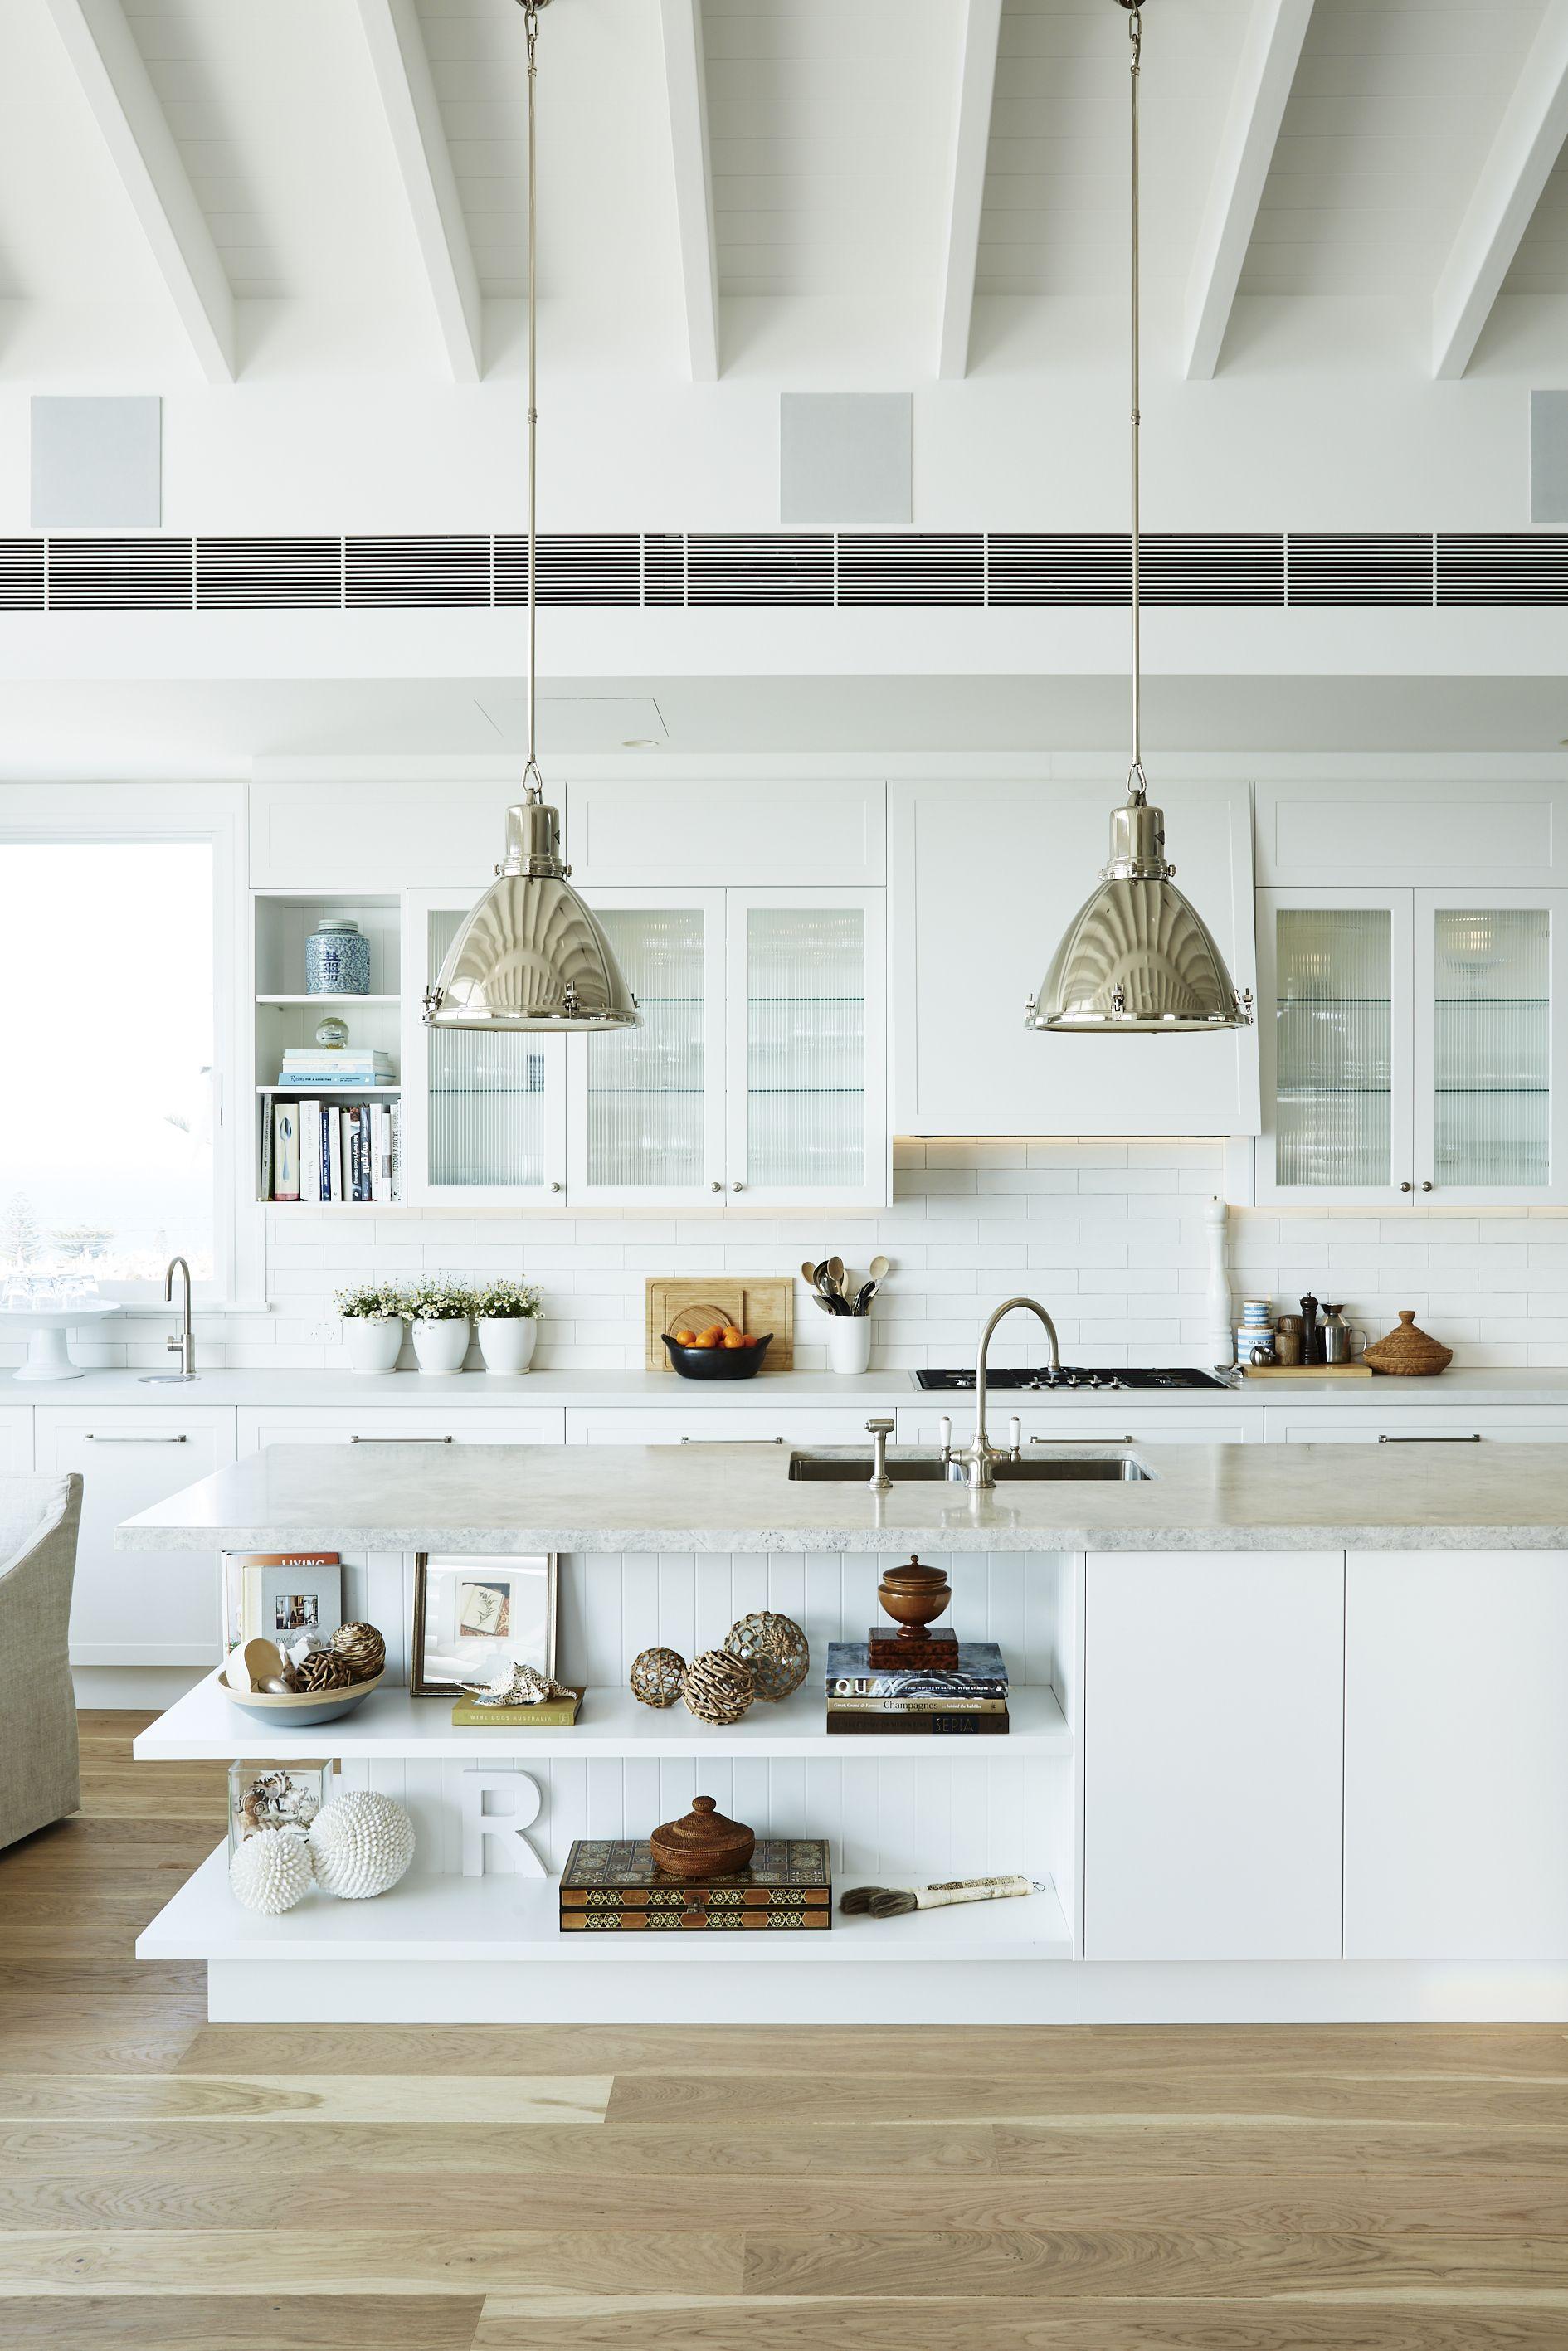 Celebrity Kitchens Designs Freedom Kitchens in 2020